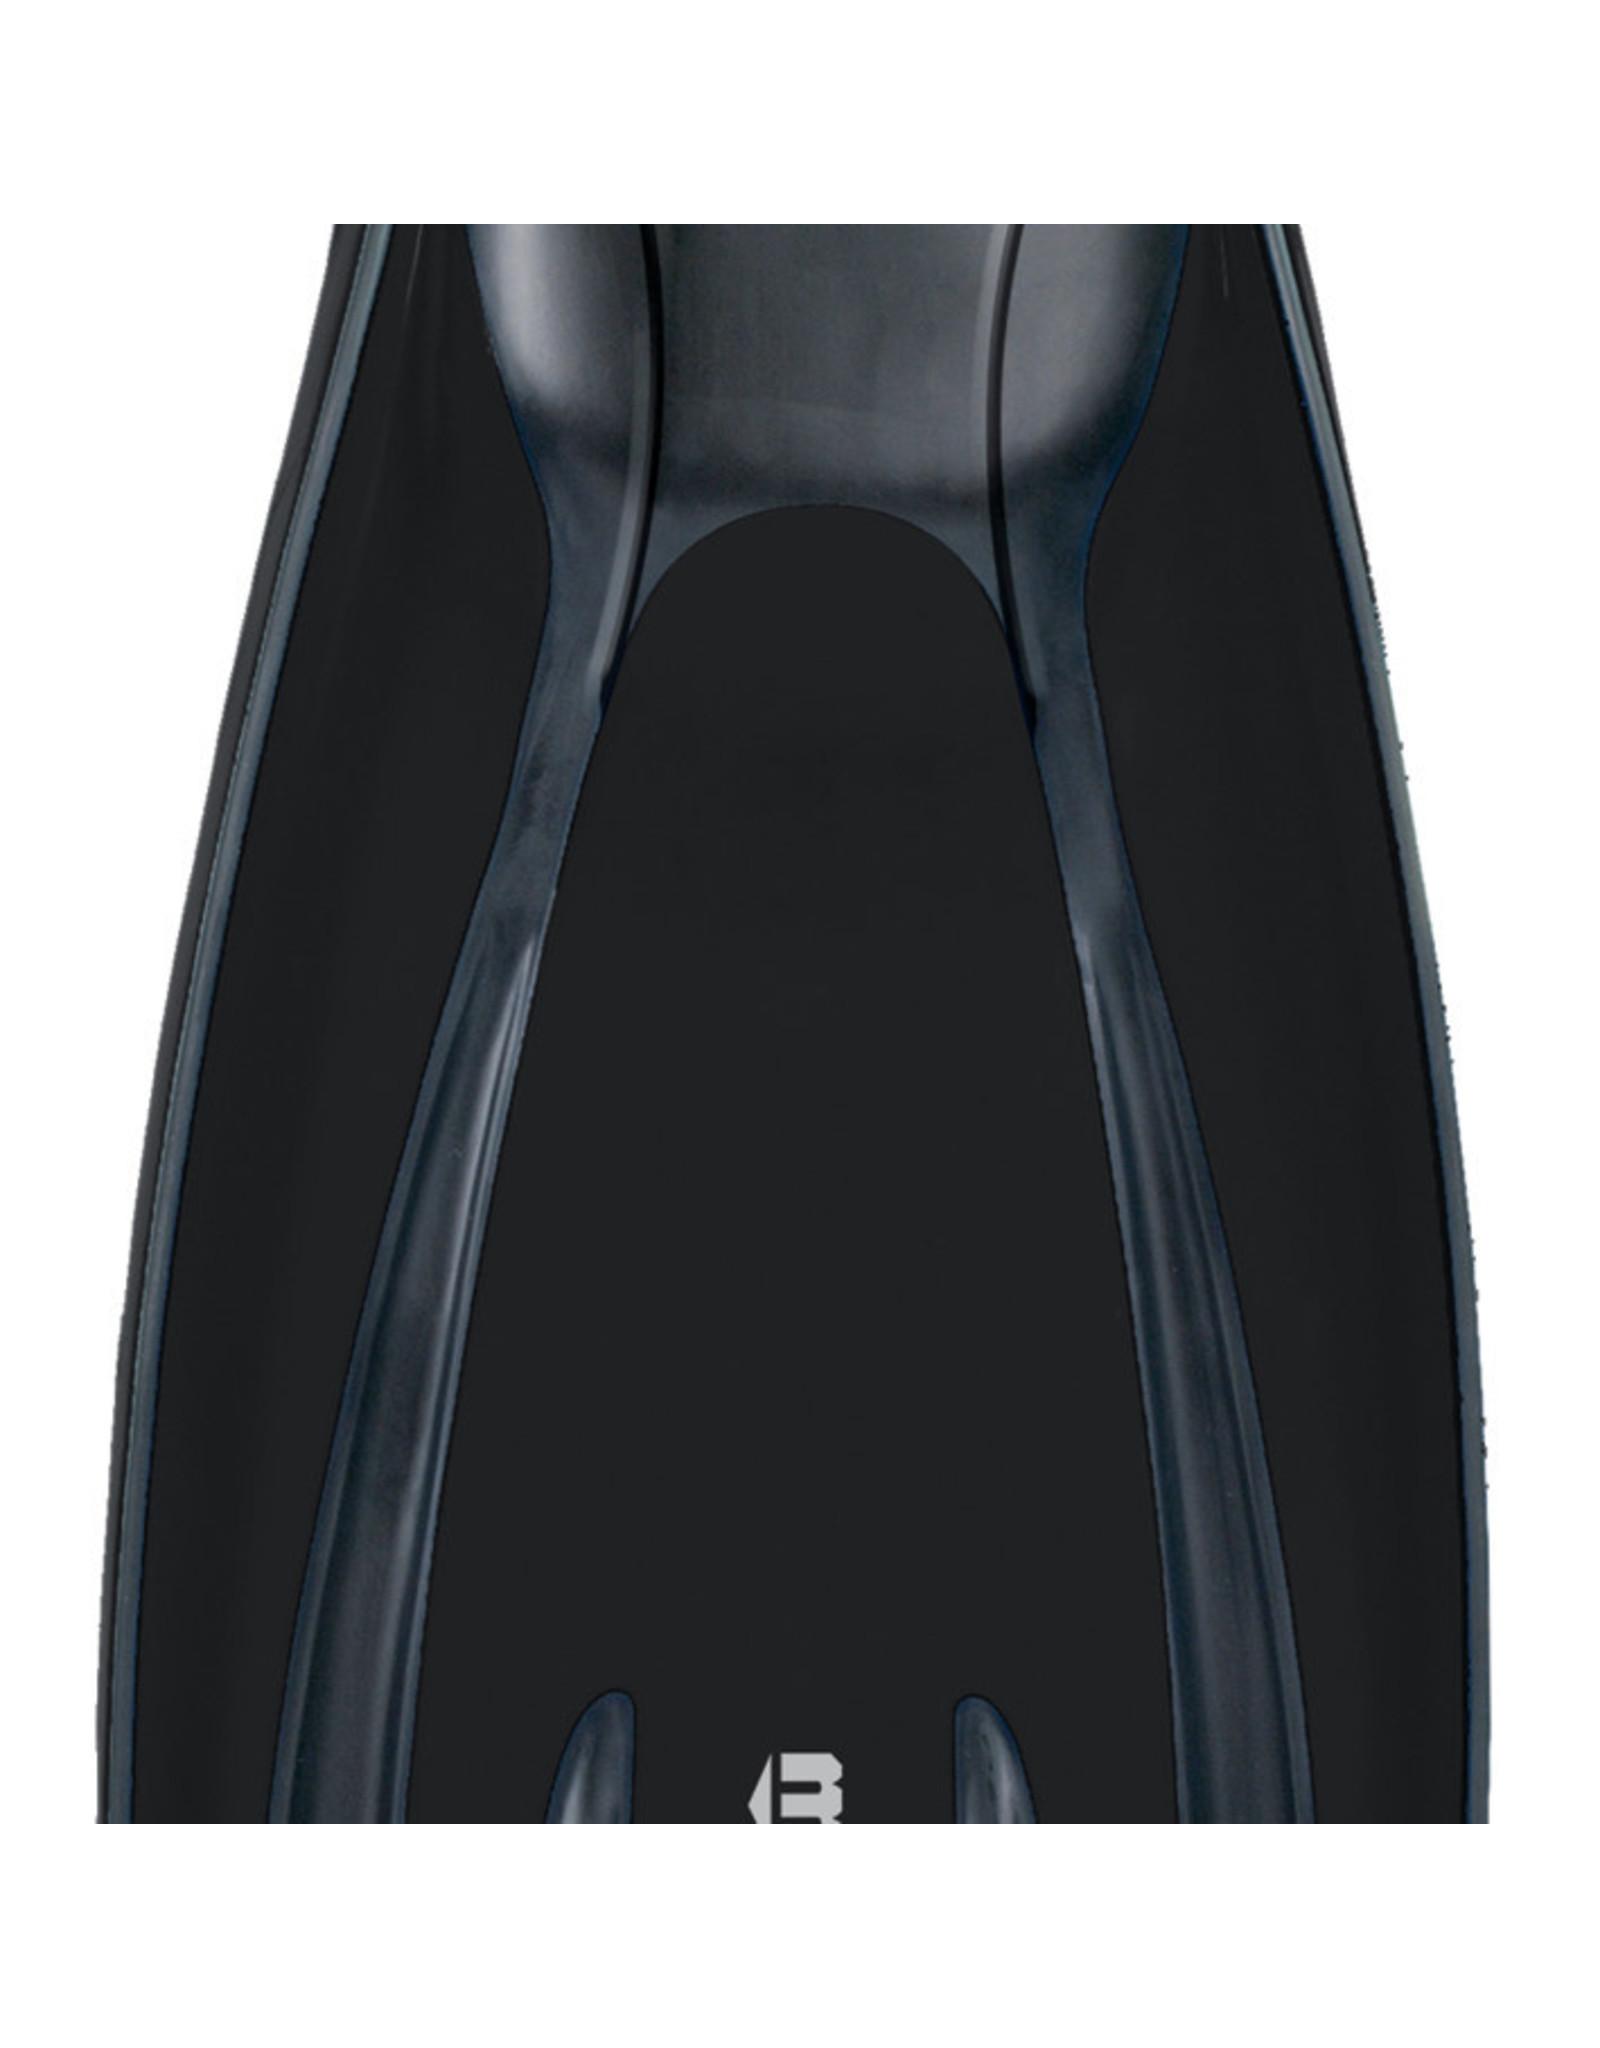 Mares Mares FIN Avanti Quatto + - Black